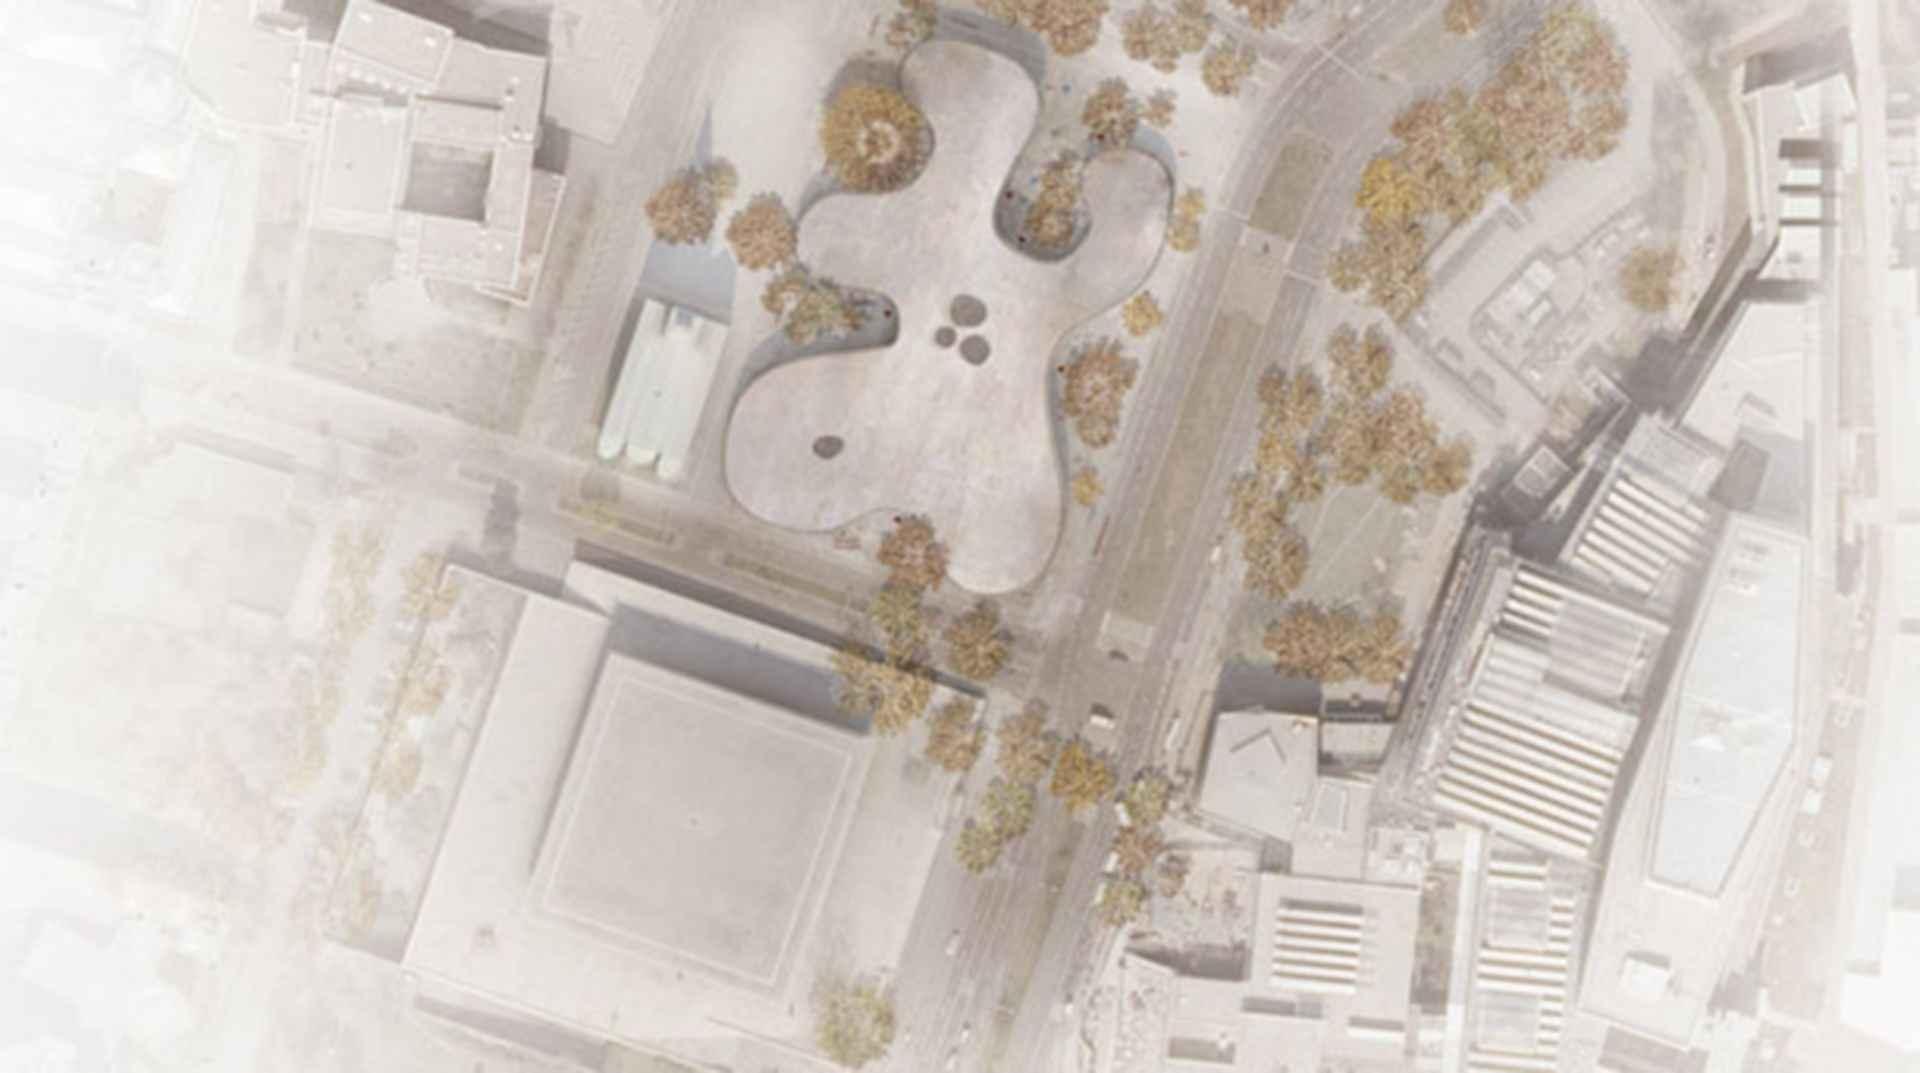 Berlin's New National Gallery - concept design